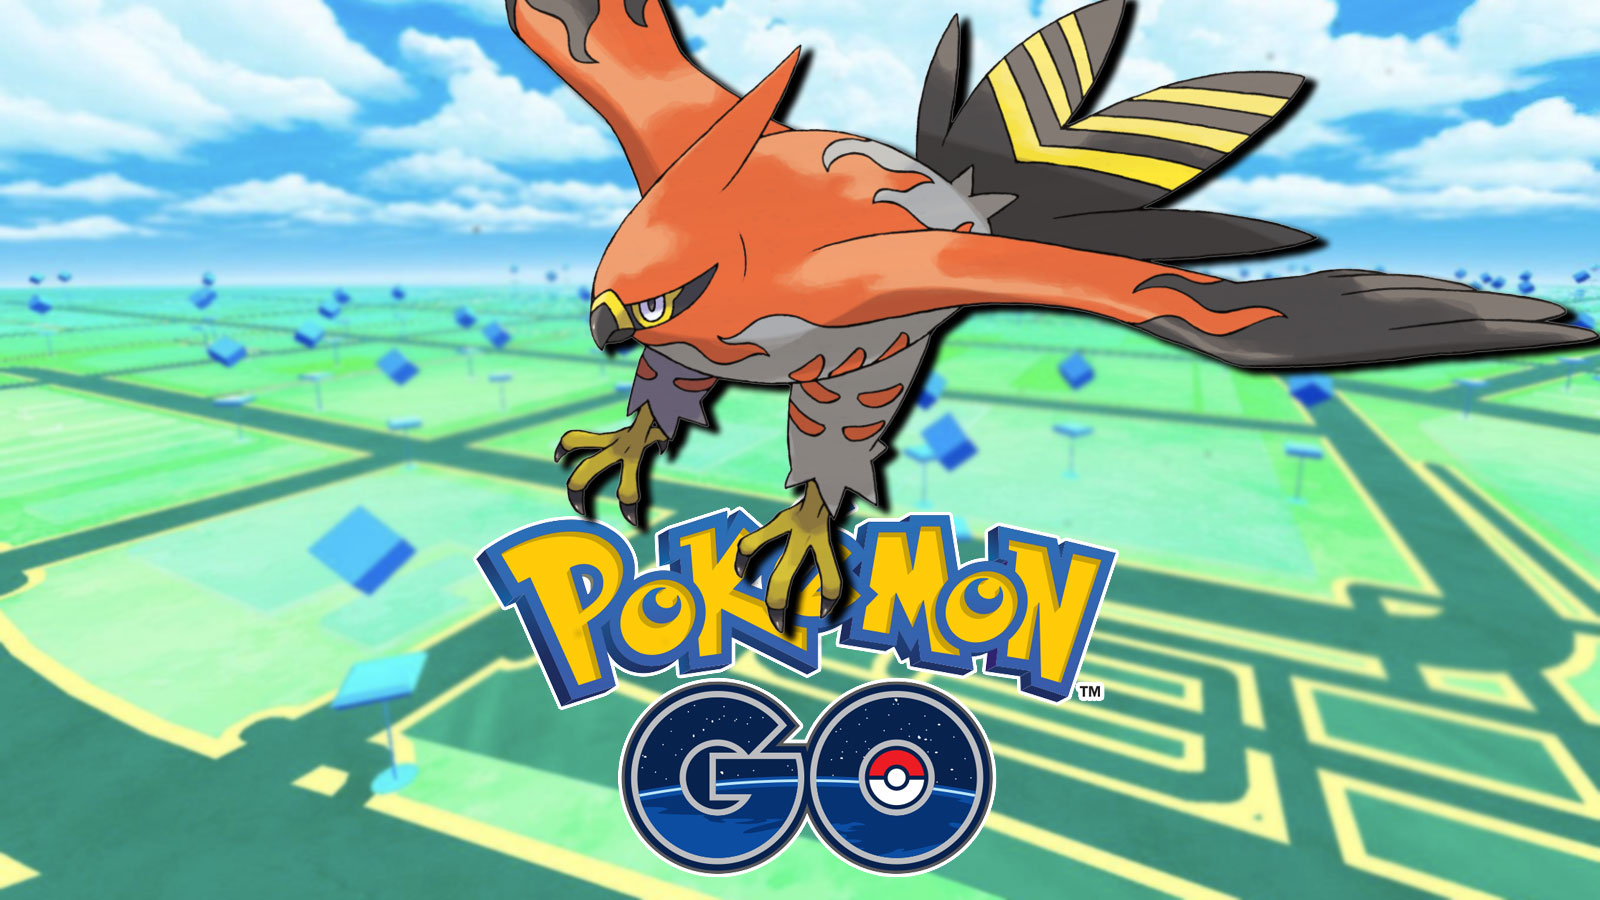 Screenshot of Talonflame flying over Pokemon Go logo.